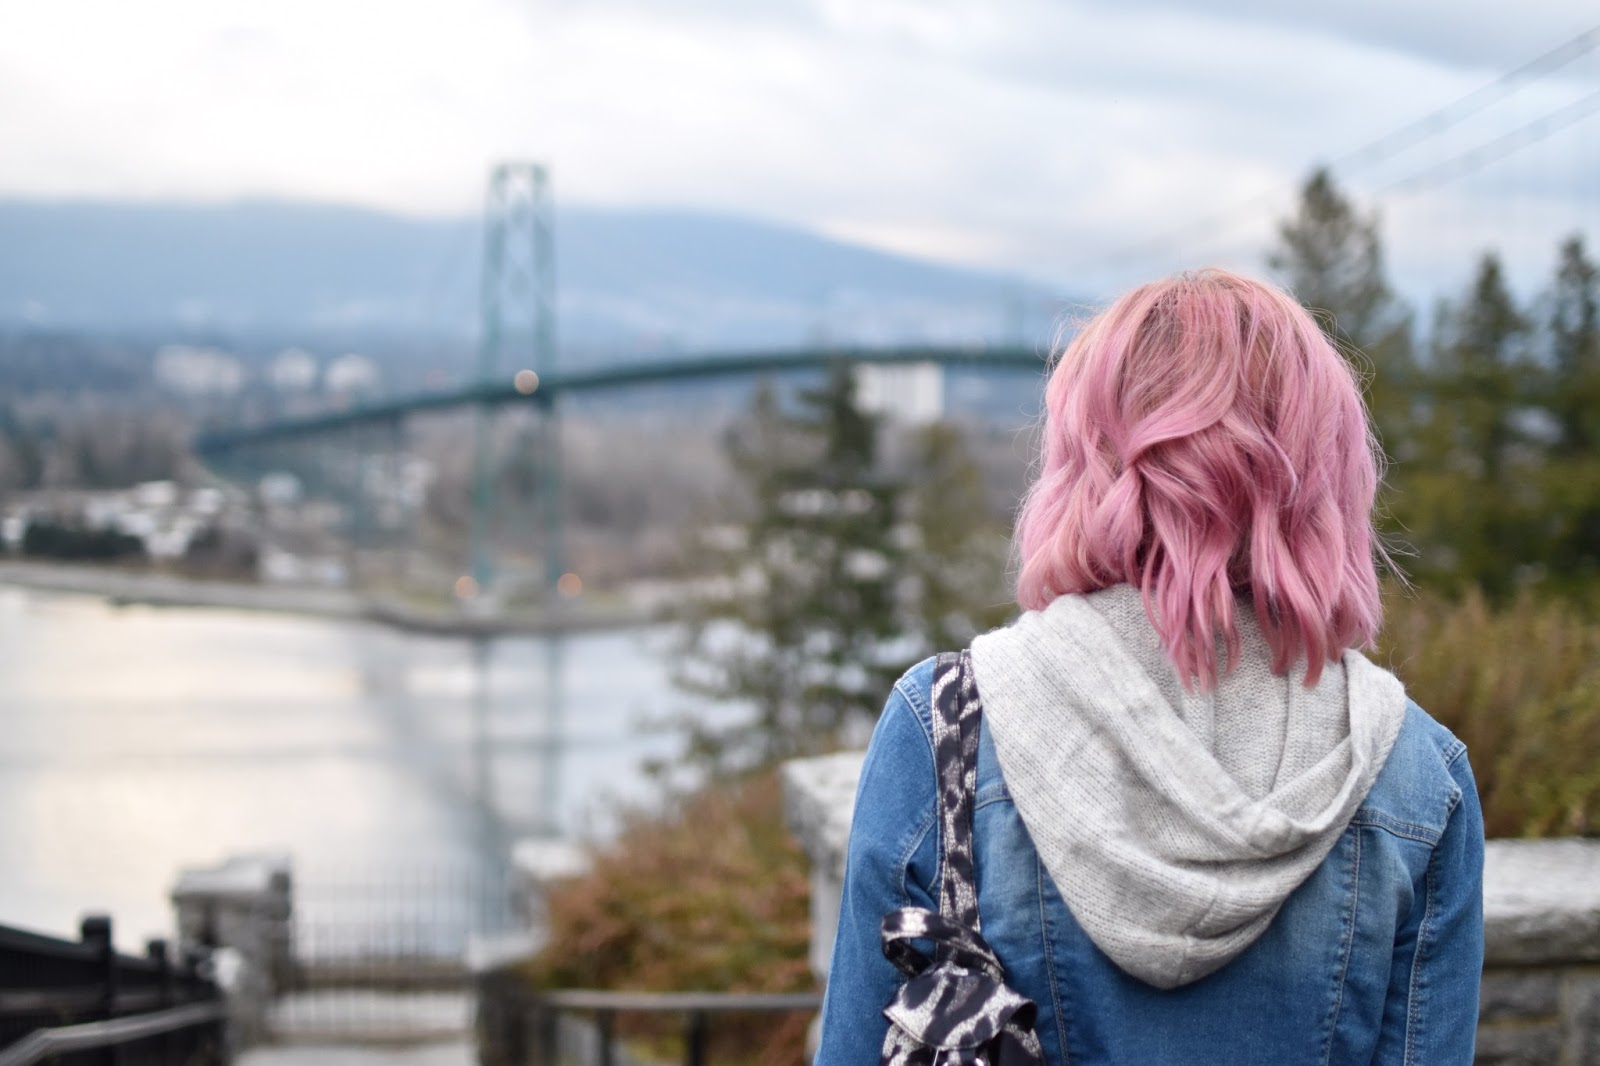 Monika Faulkner outfit inspiration - hoodie sweater, denim jacket, leopard backpack, pink hair